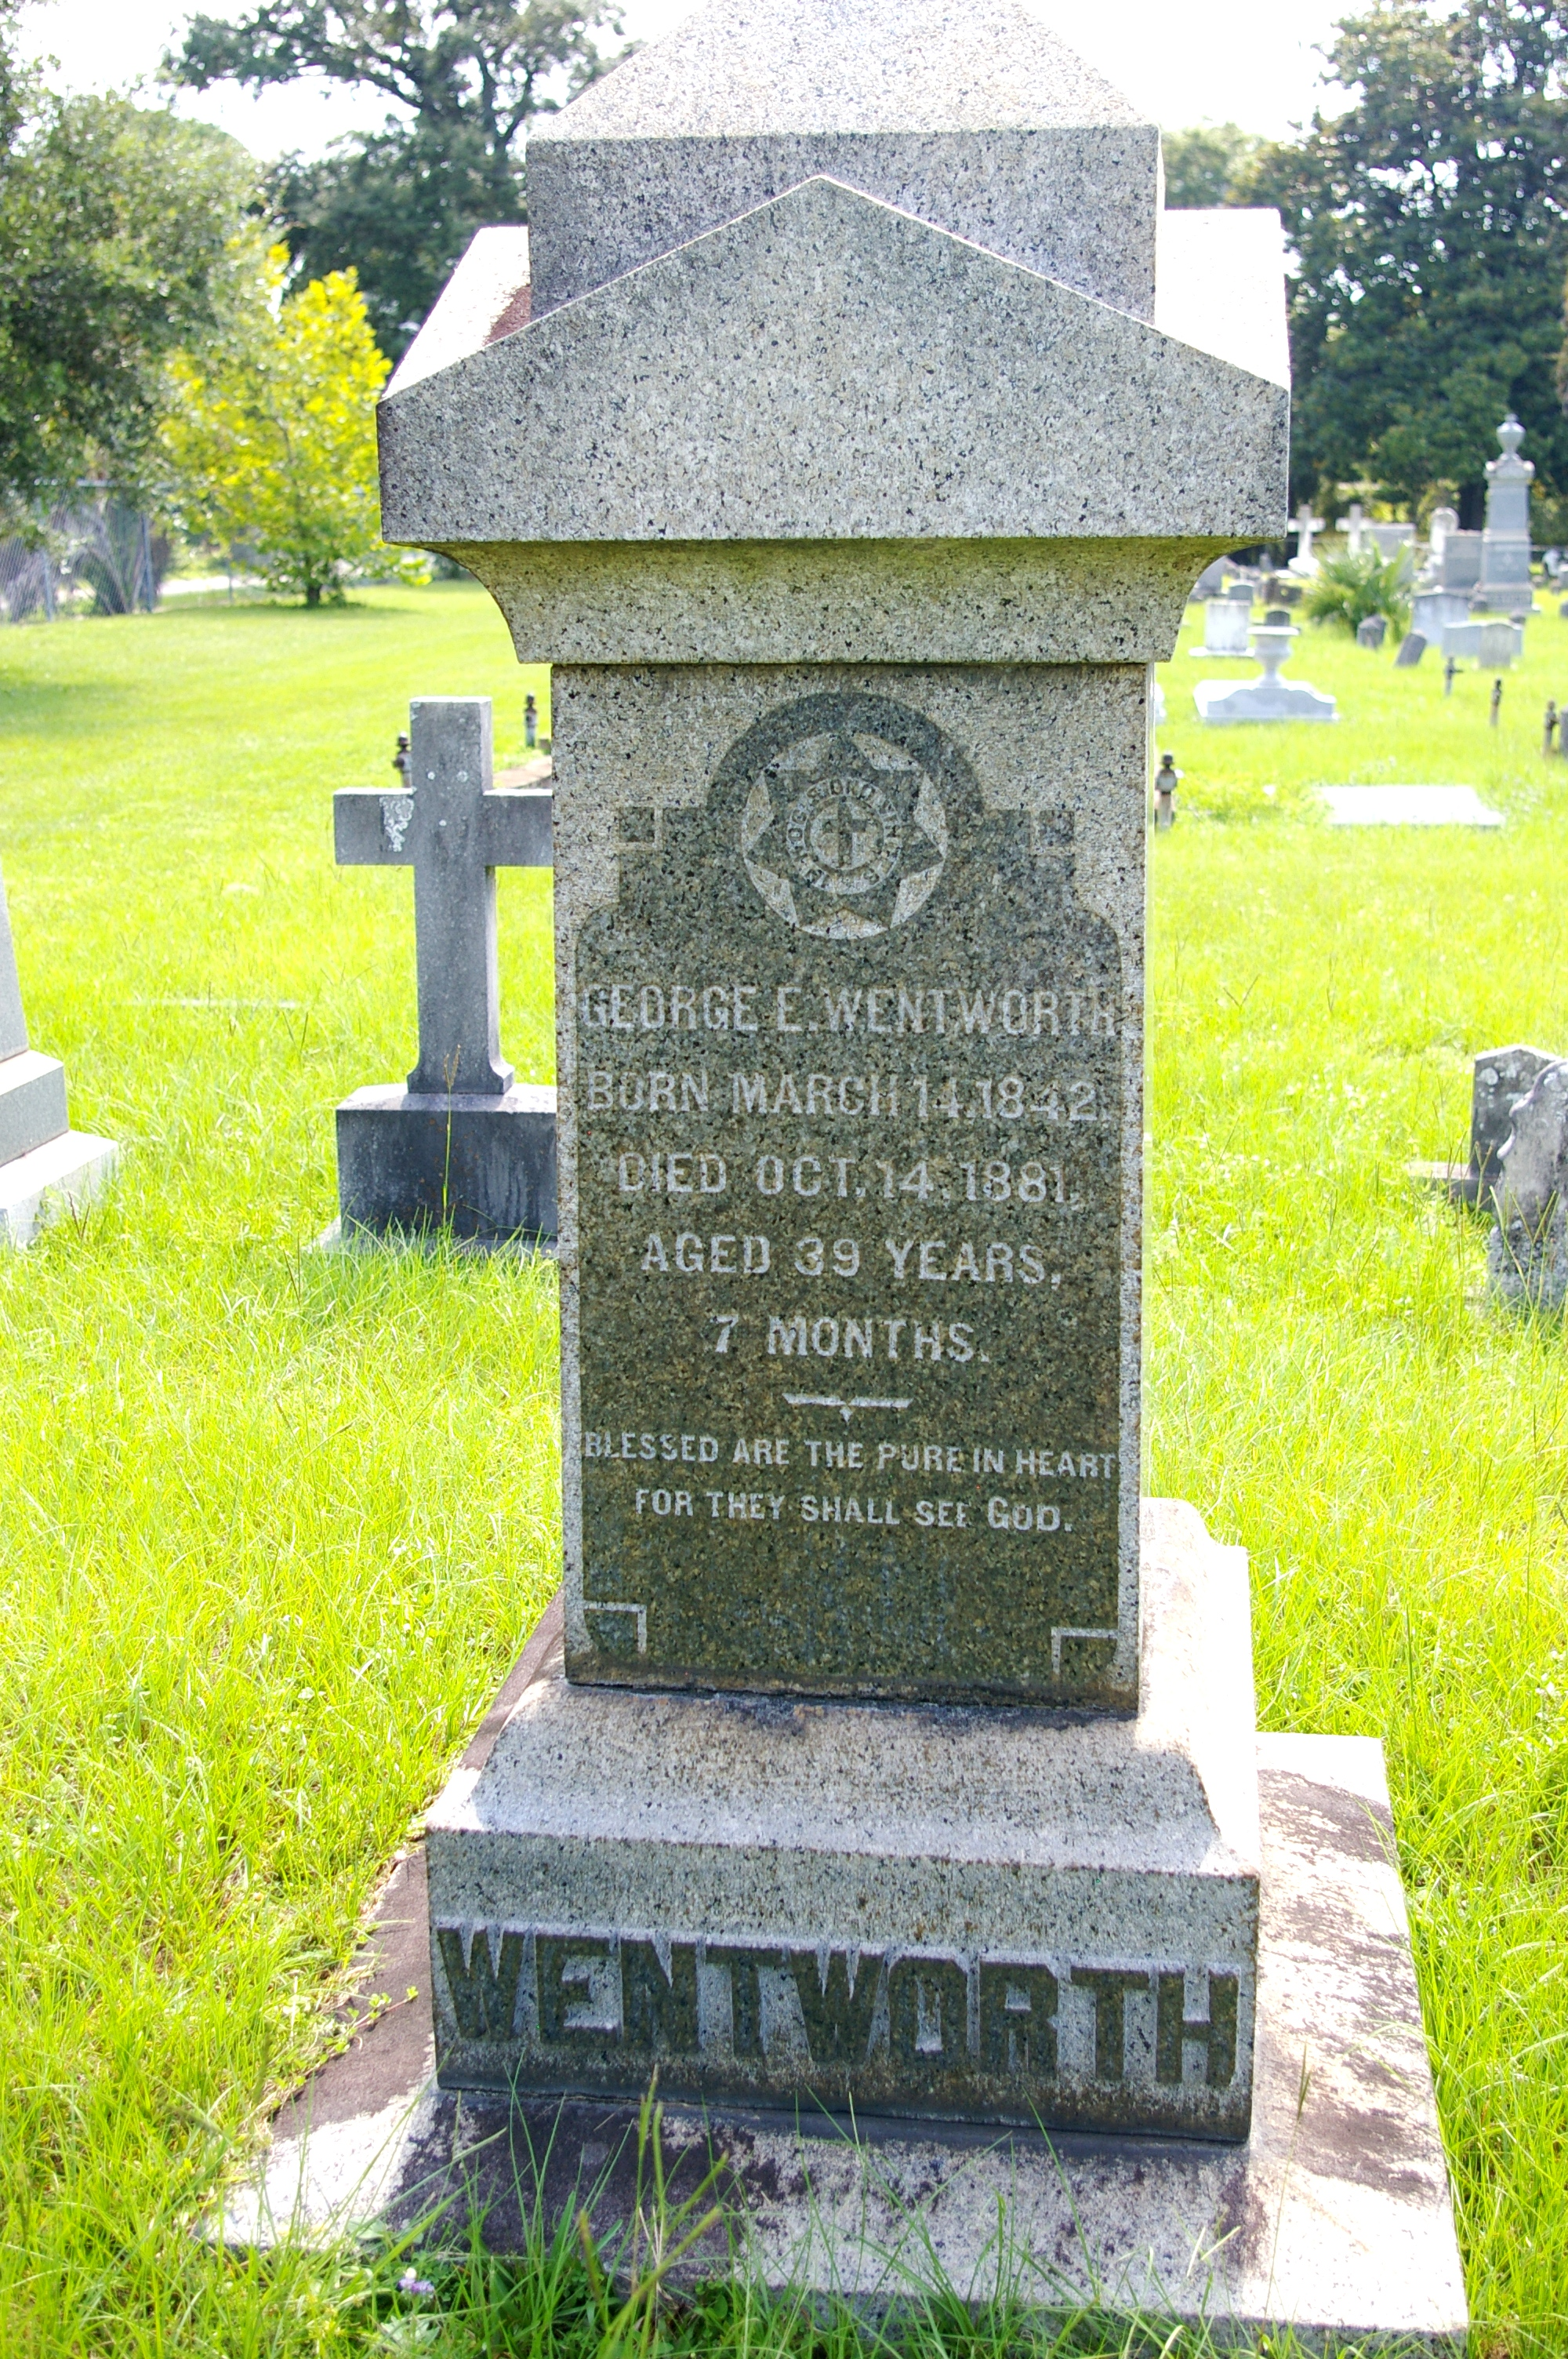 George E. Wentworth